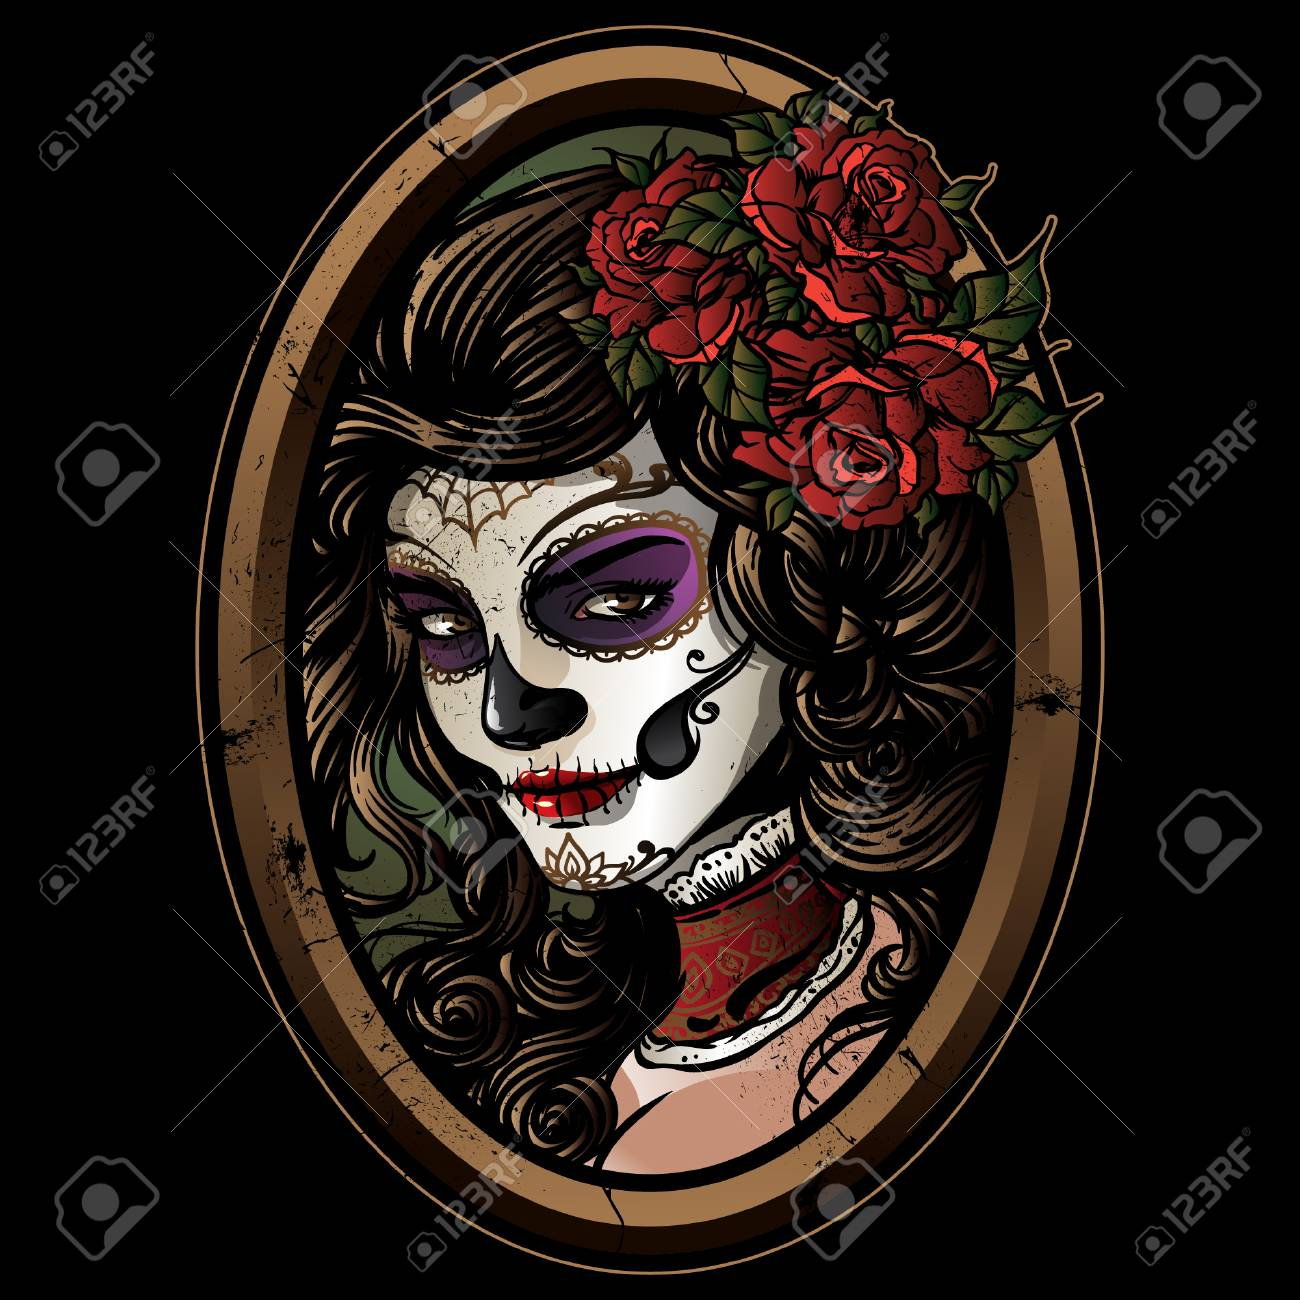 Sugar Skull Girl Illustration Royalty Free Cliparts Vectors And Stock Illustration Image 106276918